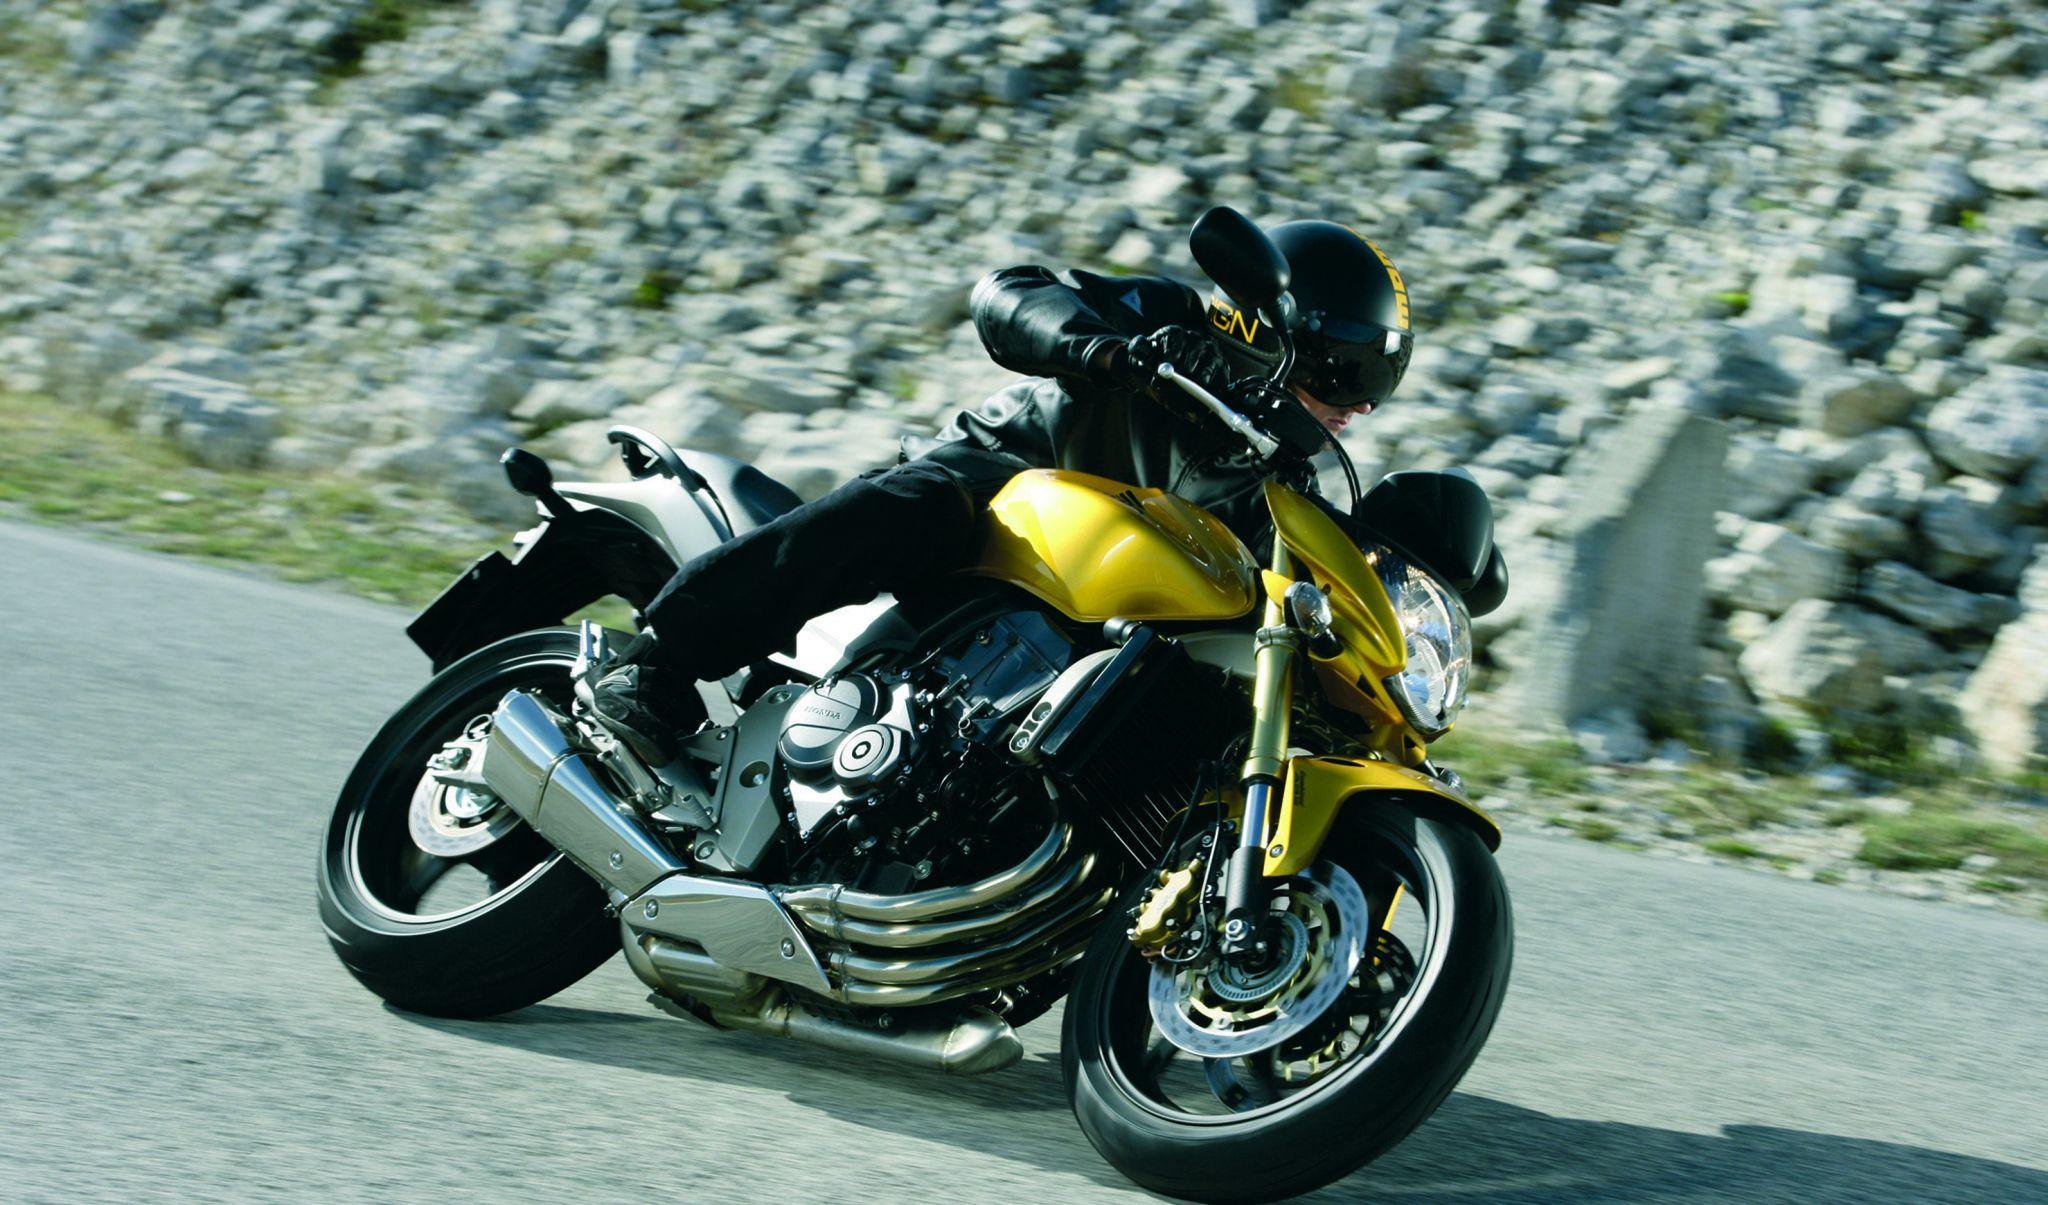 Honda Cb 600 Hornet Opinia świata Motocykli świat Motocykli